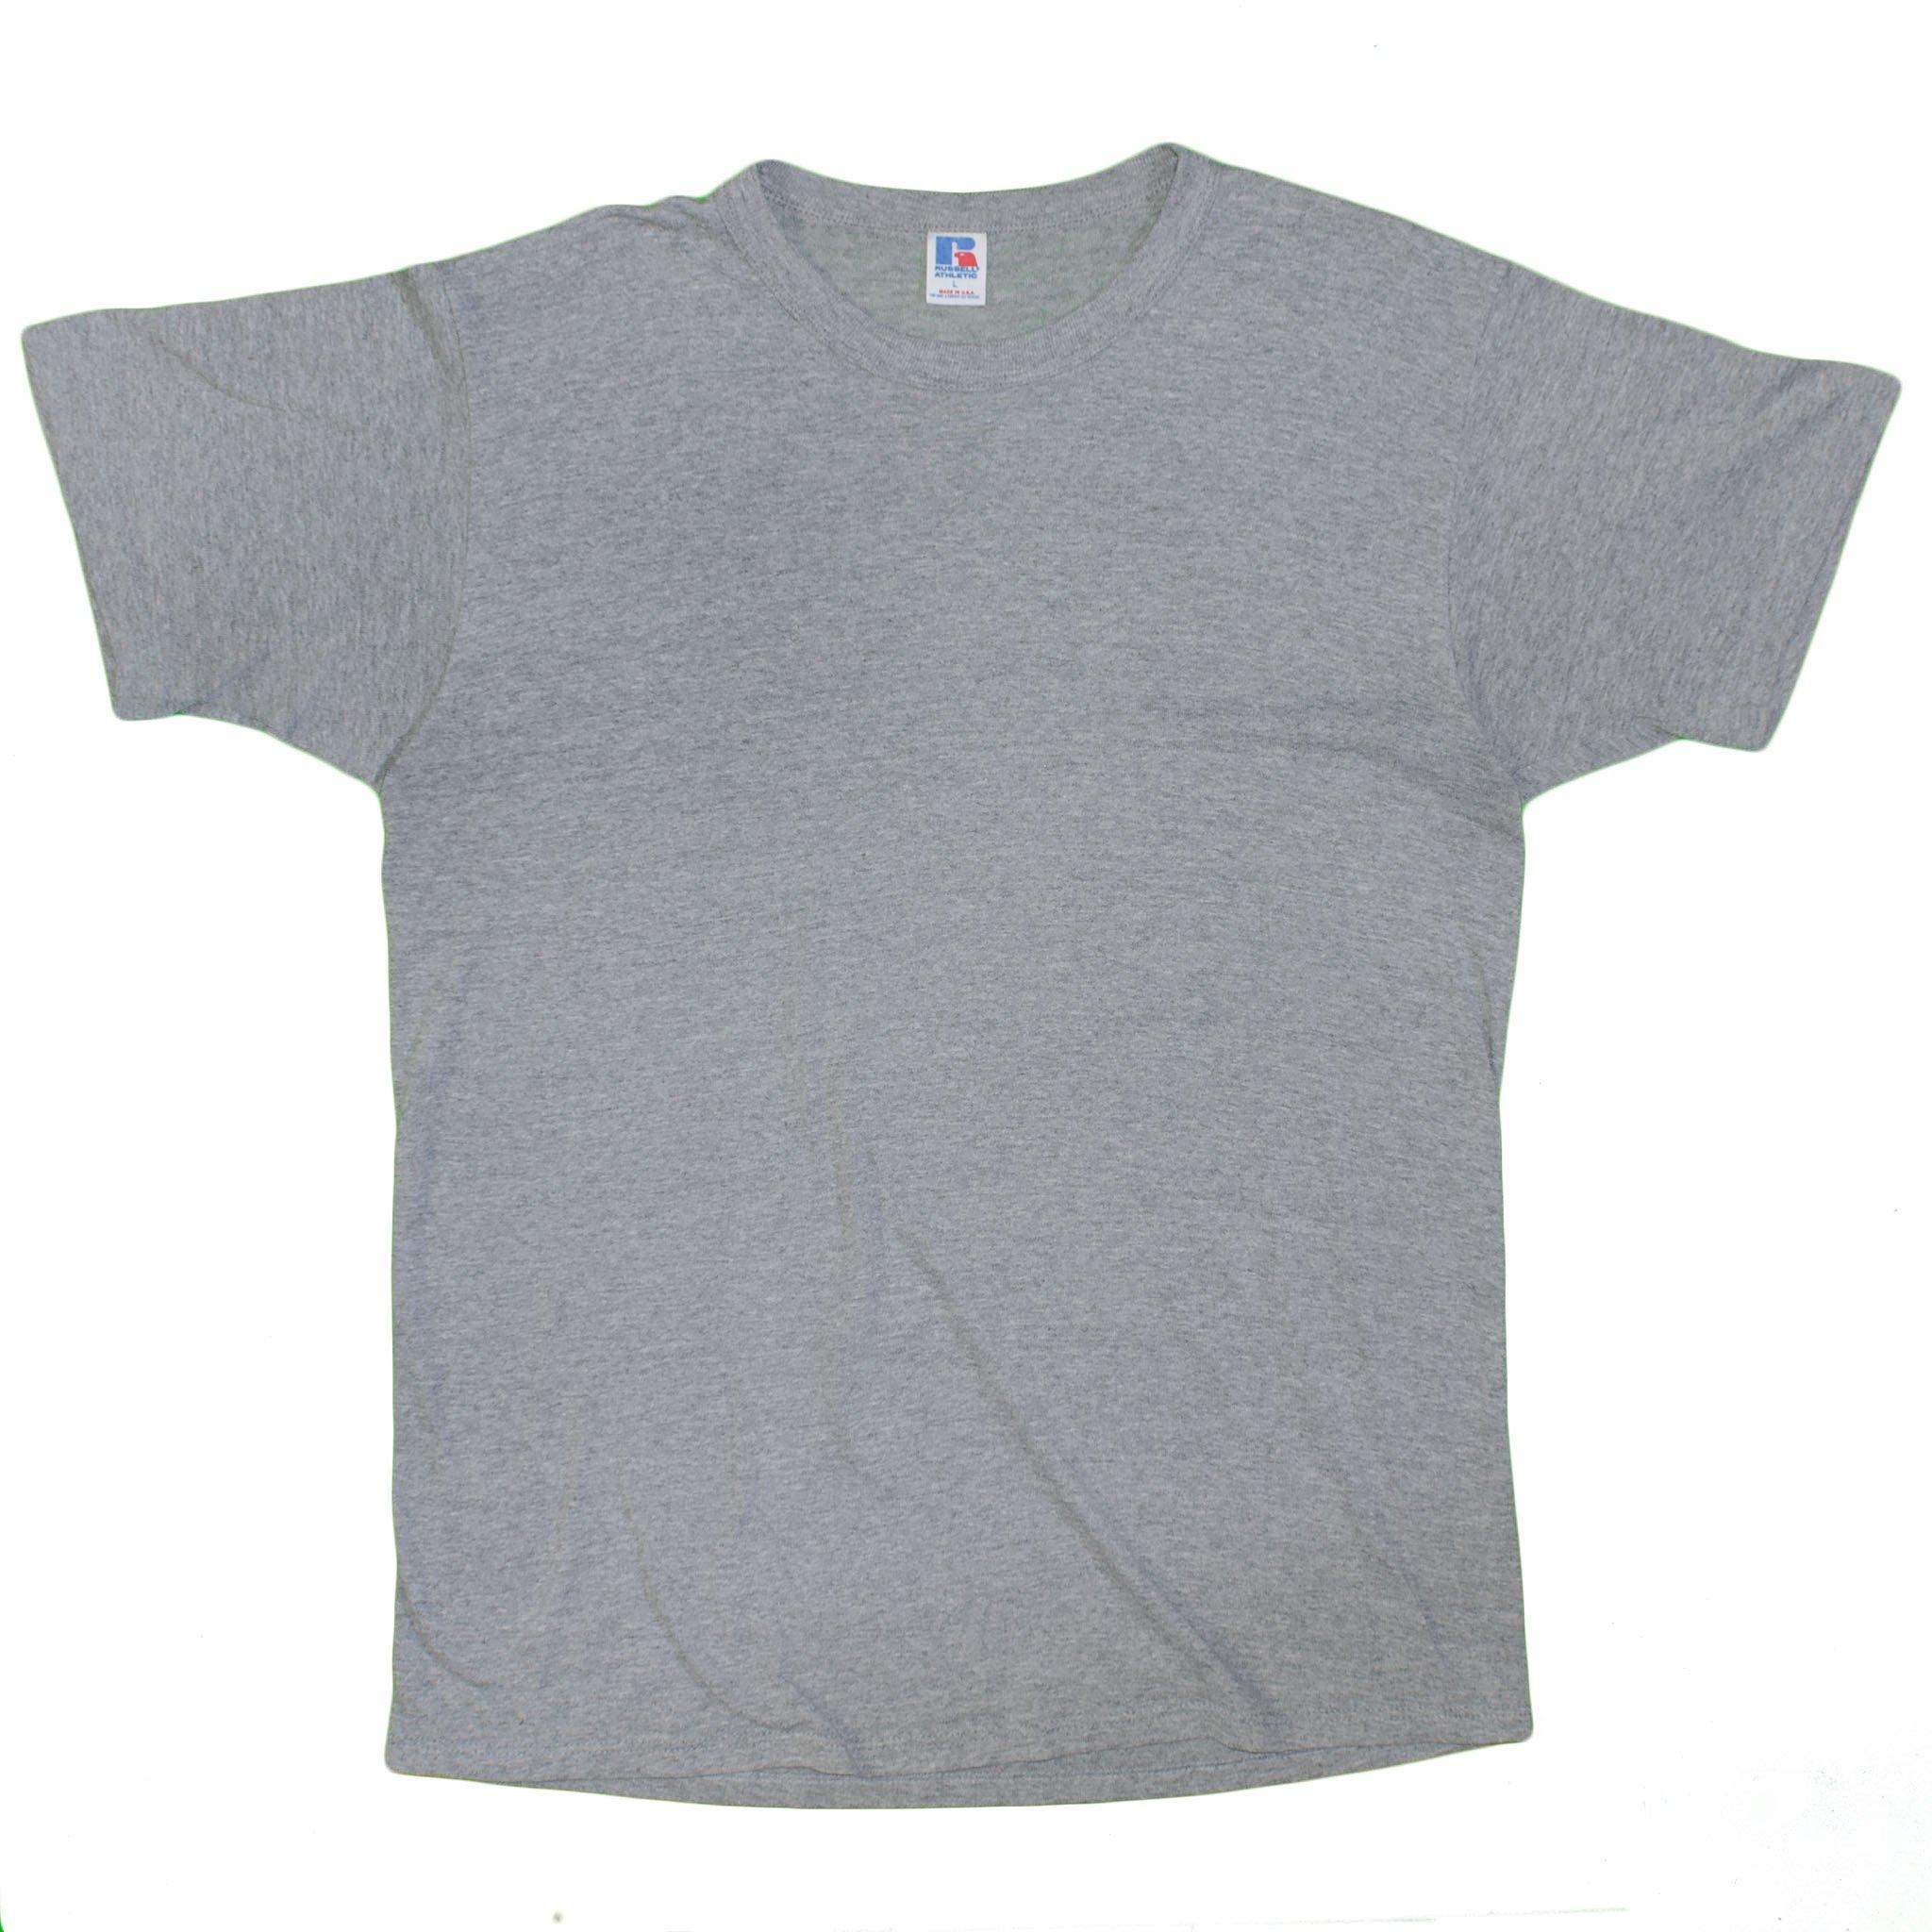 Russell Athletic Men s T Shirt Vintage Gray Blank Short Sleeve